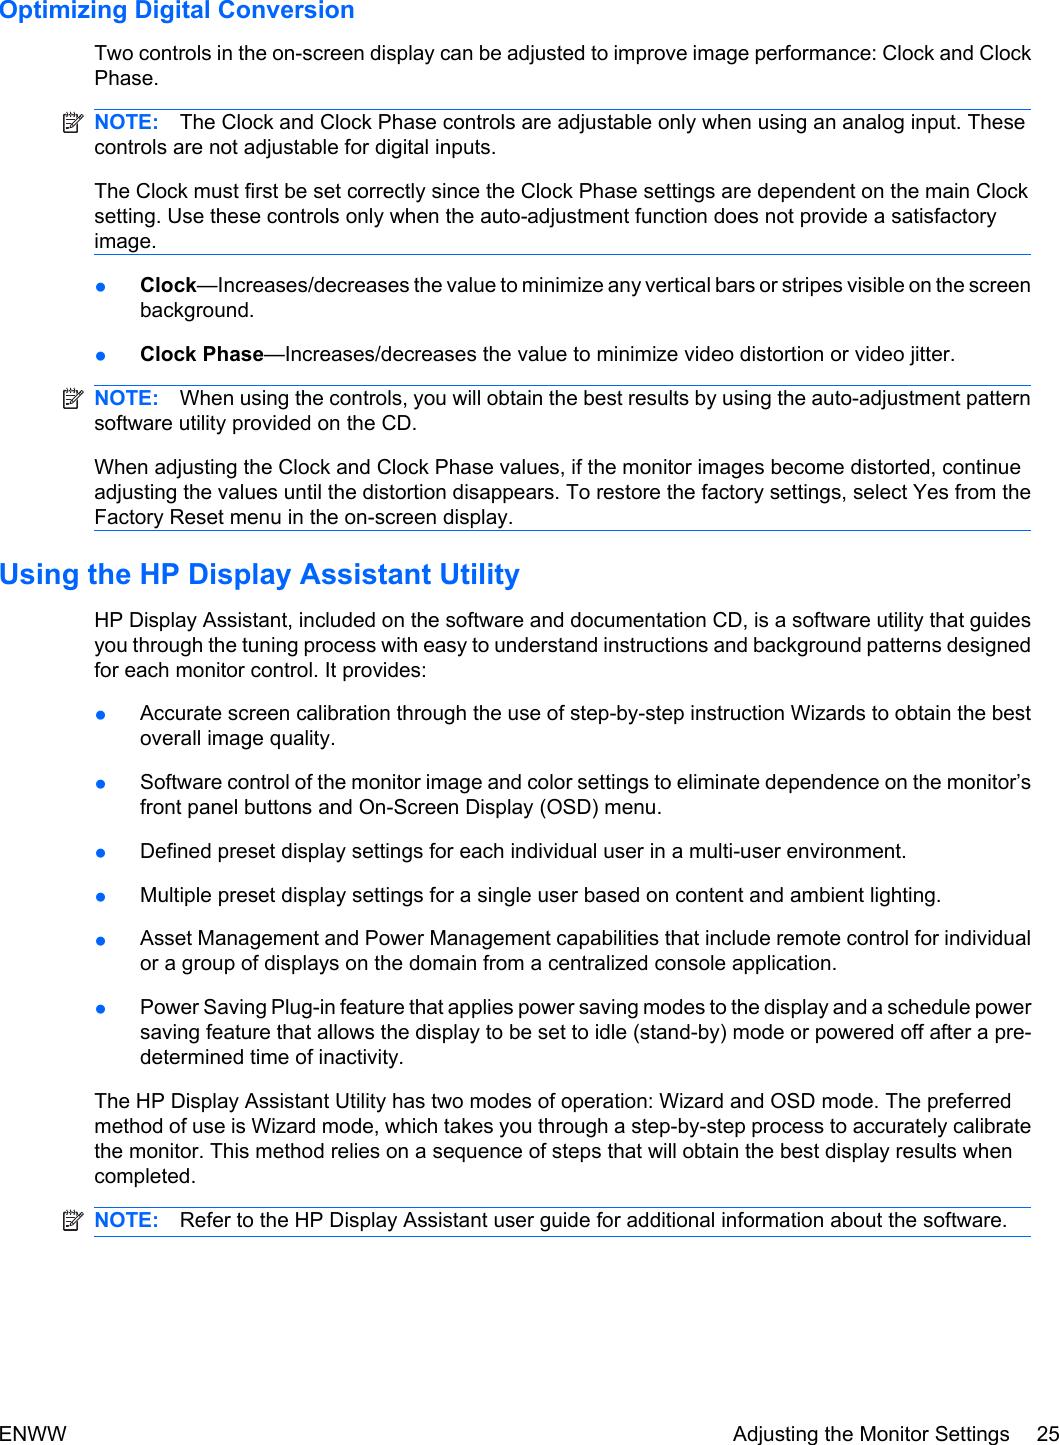 Hp Computer Monitor Zr22W Users Manual ZR24w User Guide